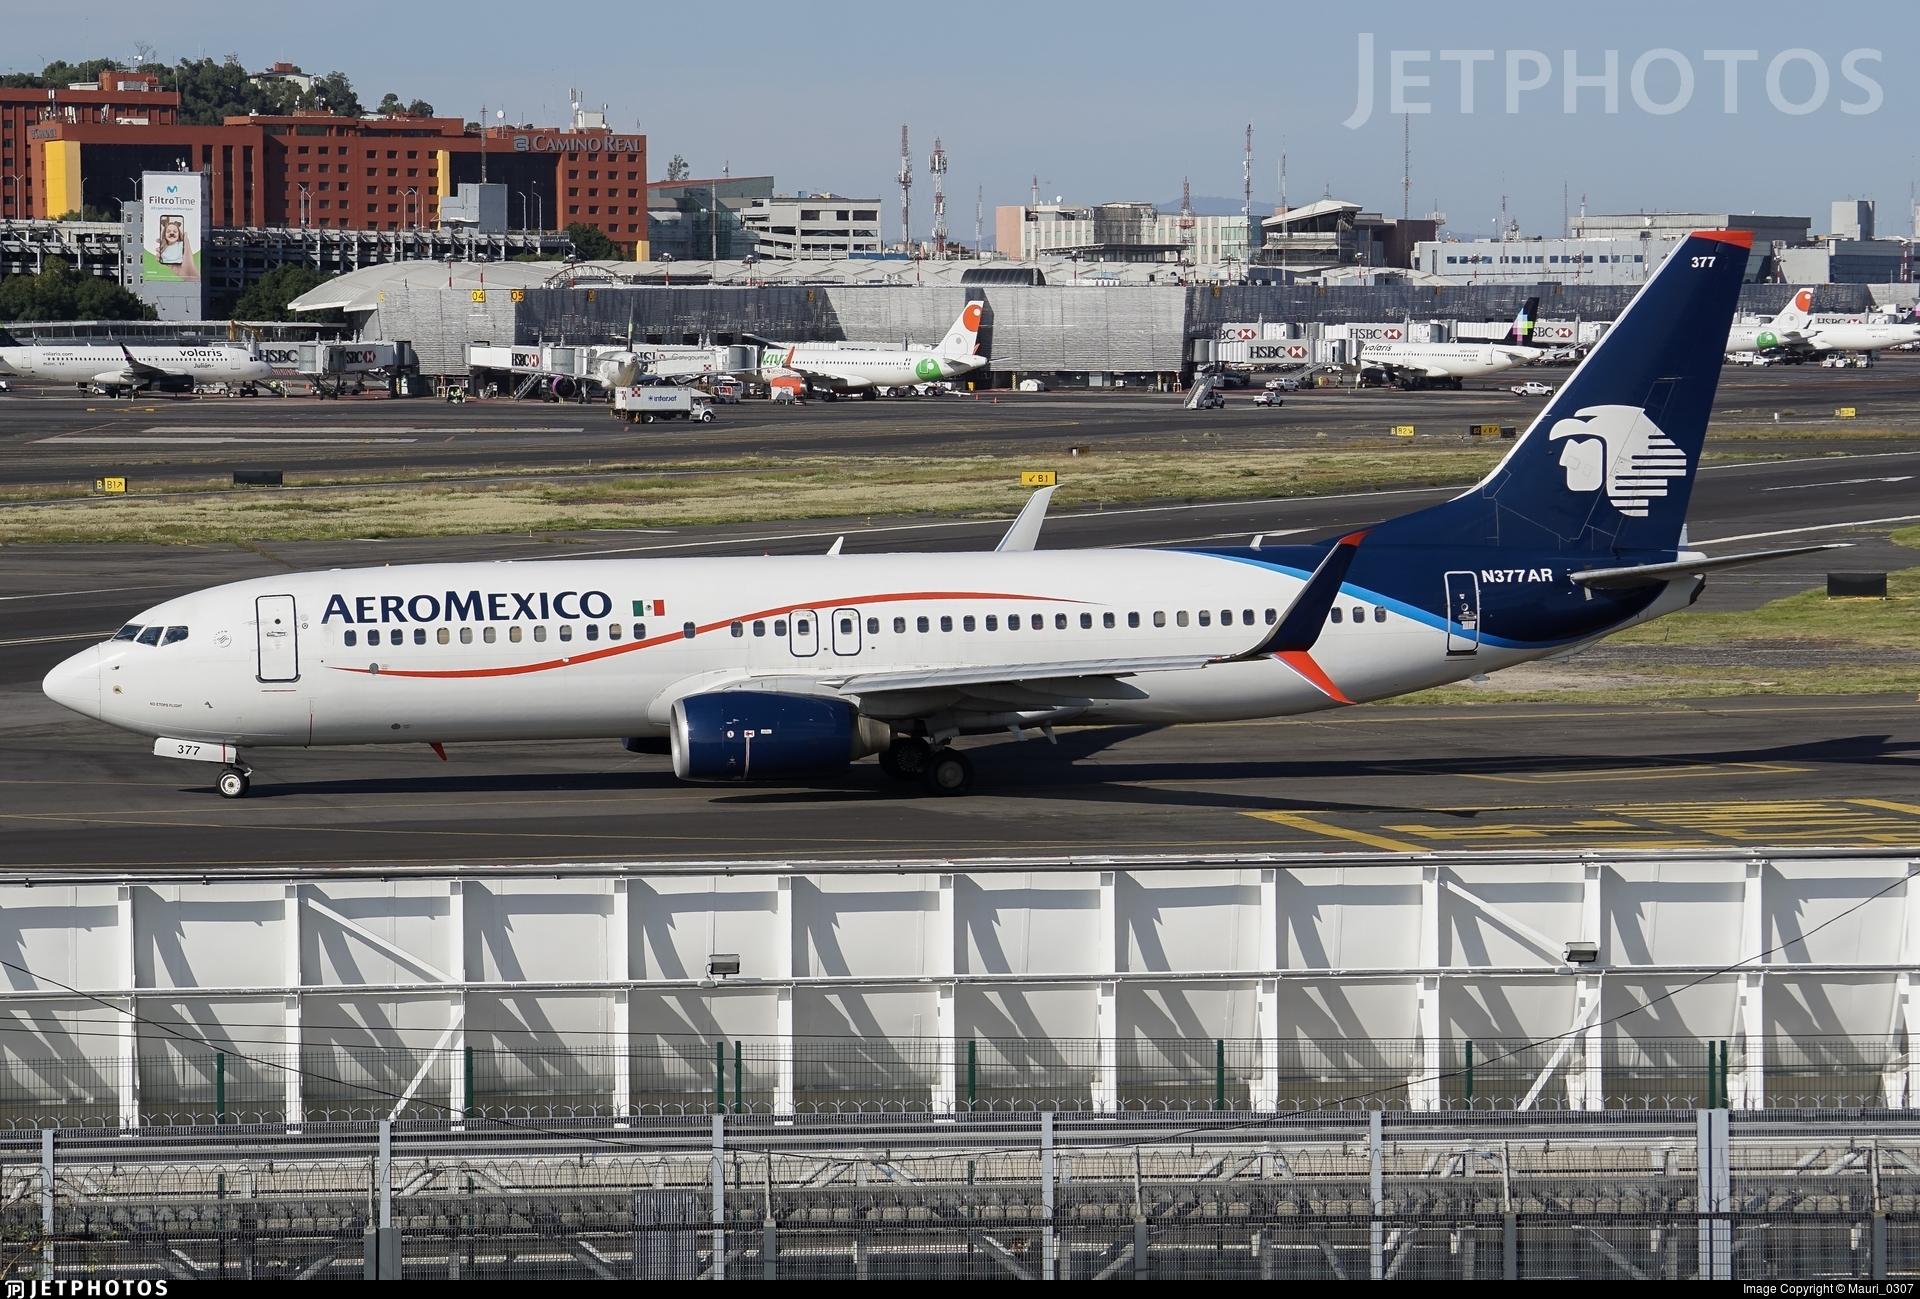 N377AR - Boeing 737-86J - Aeroméxico